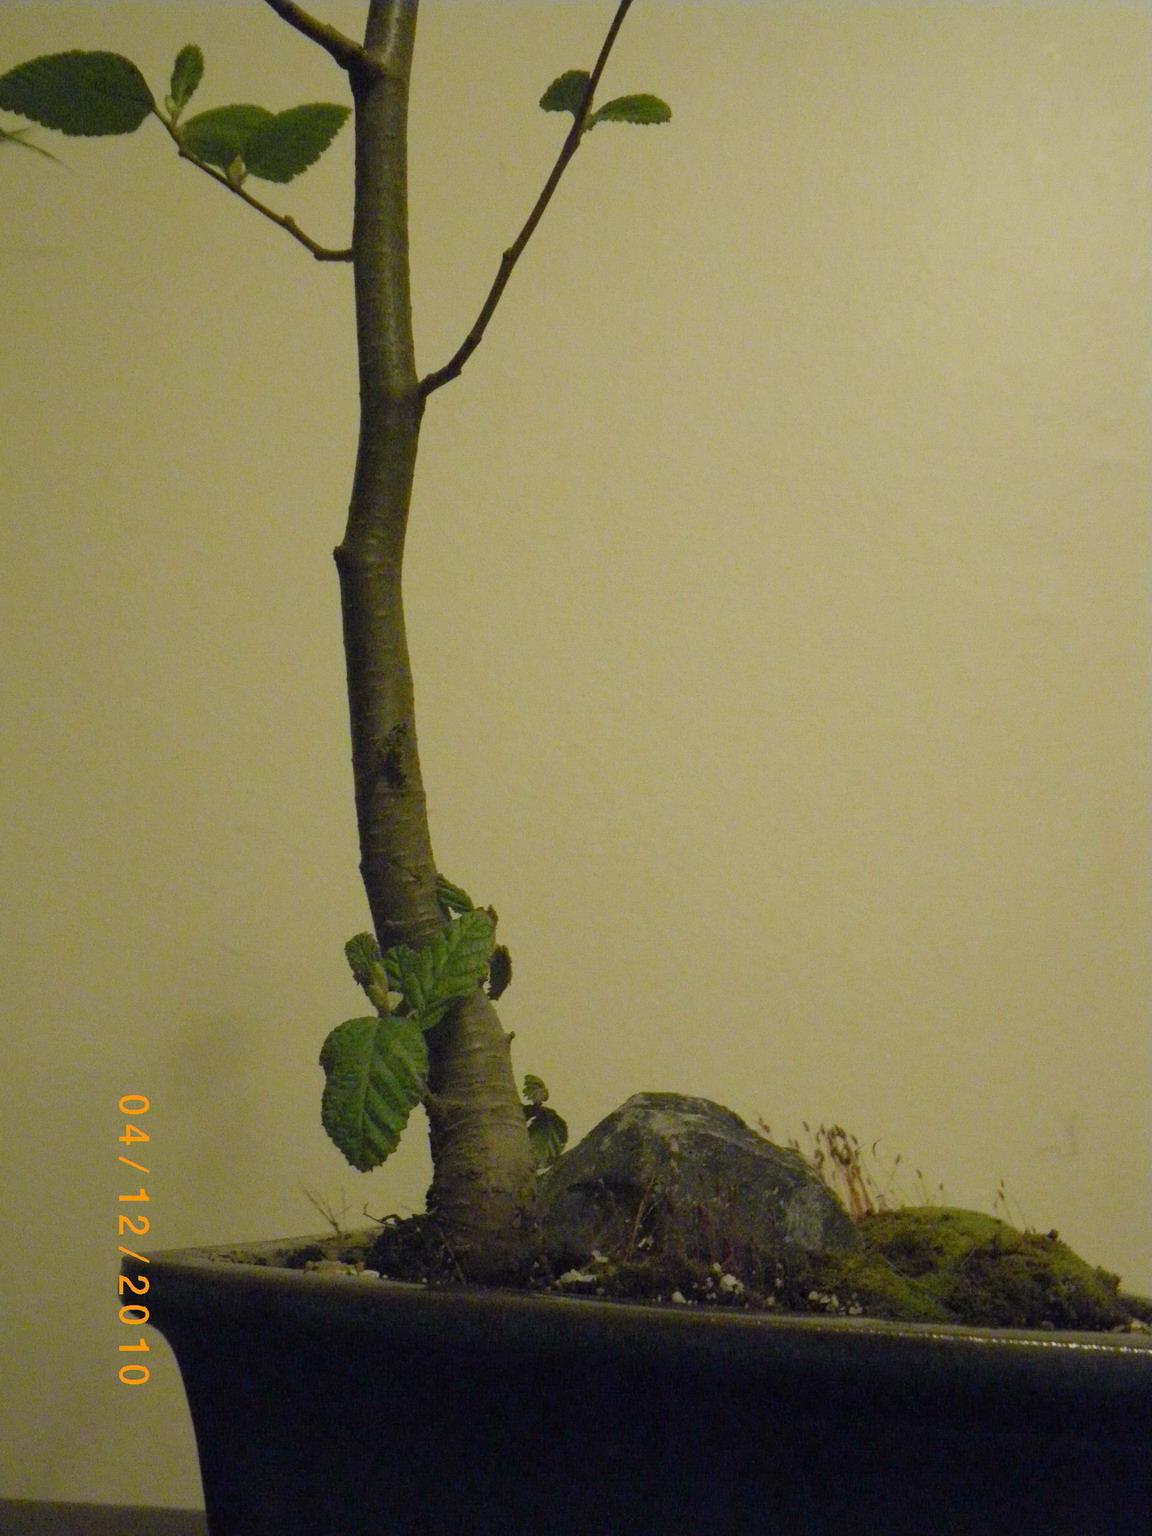 Scented Leaf Truffle Bonsai